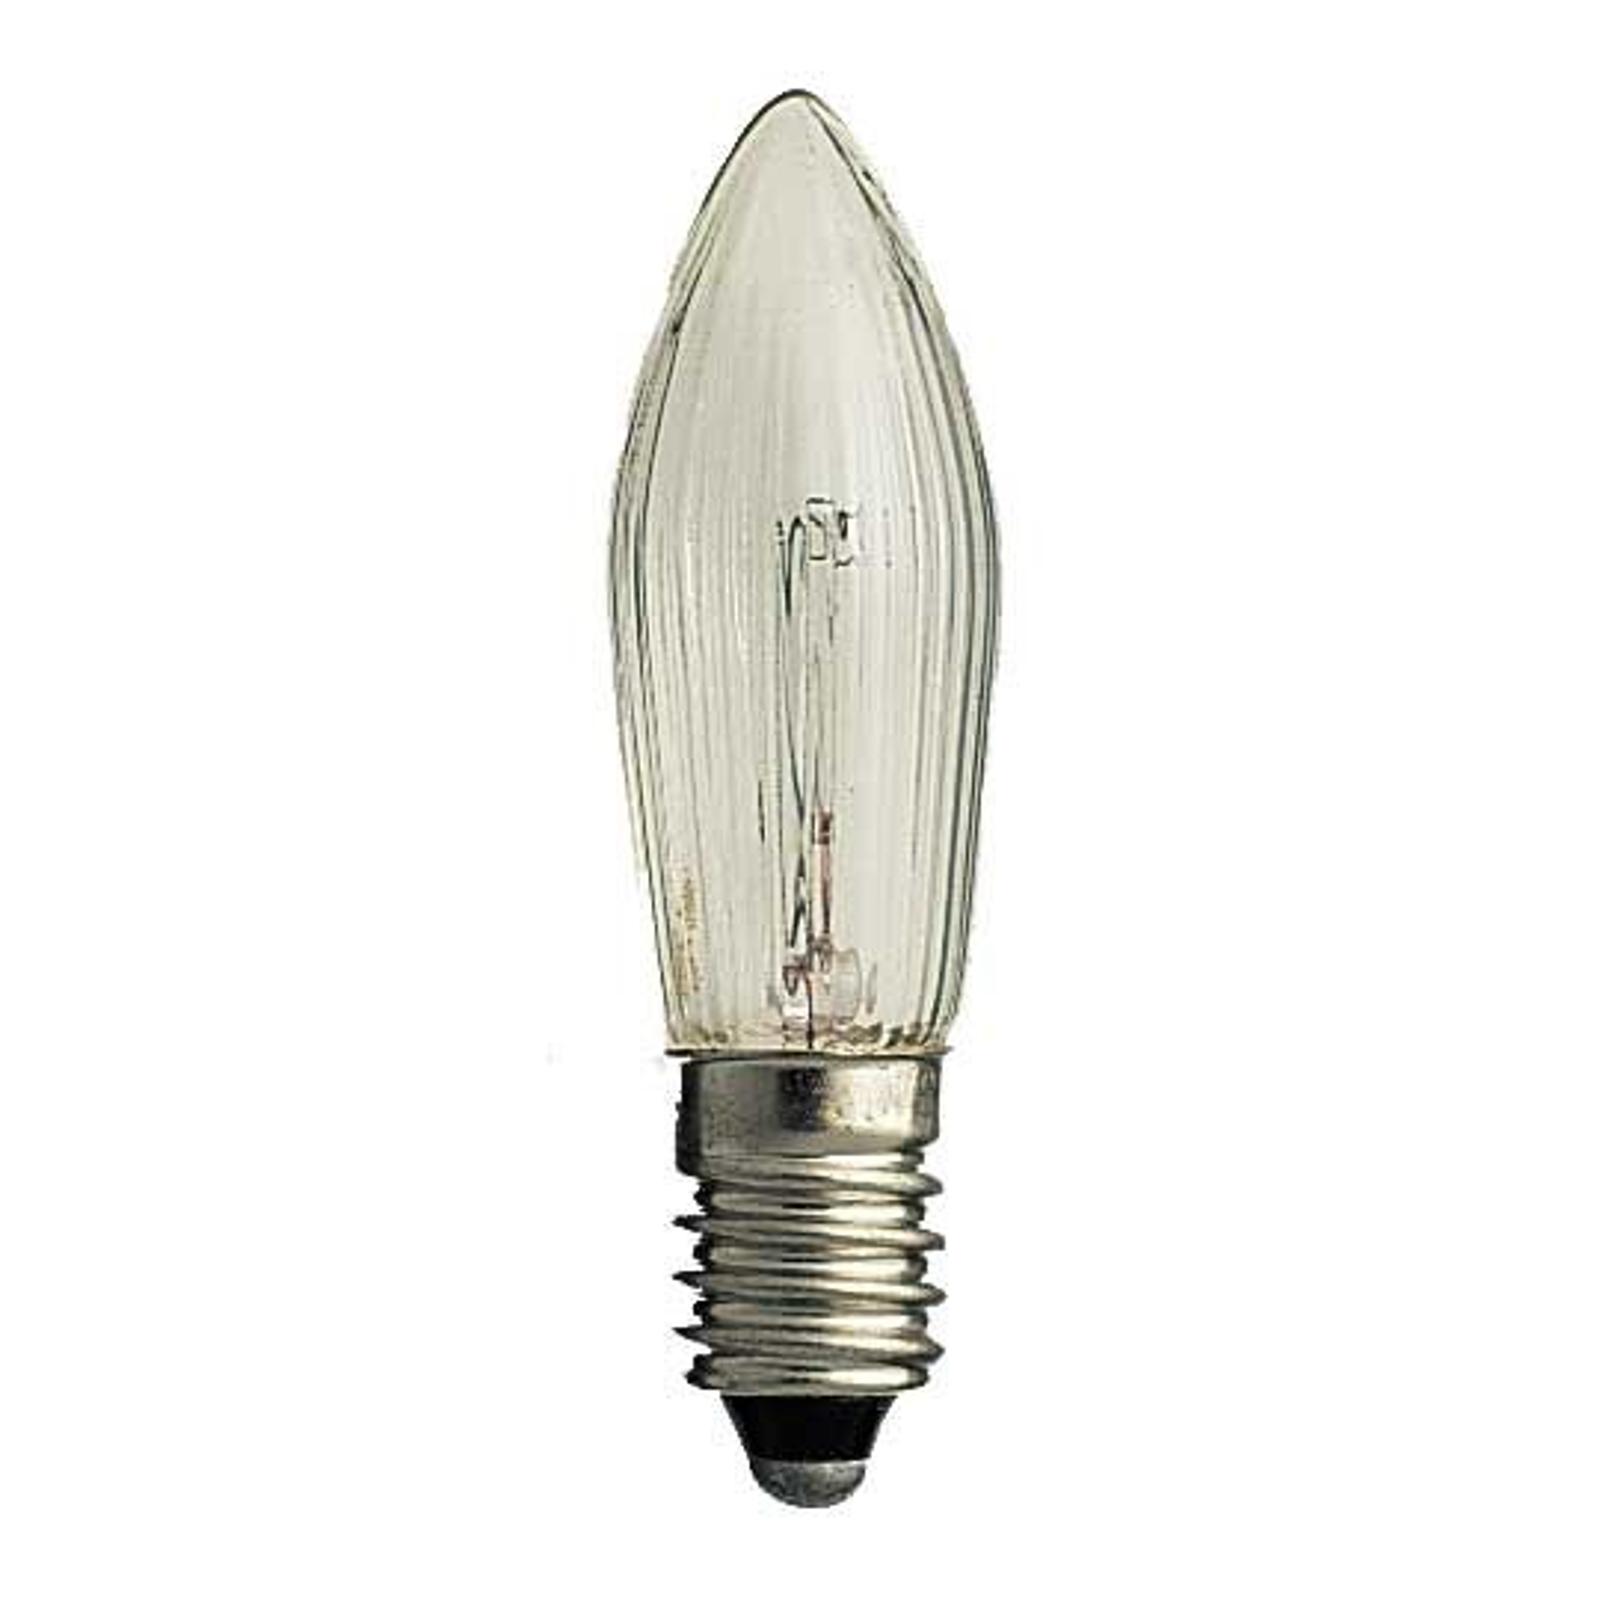 E10 3W 55V lampe bougie de rechange Pack de 3